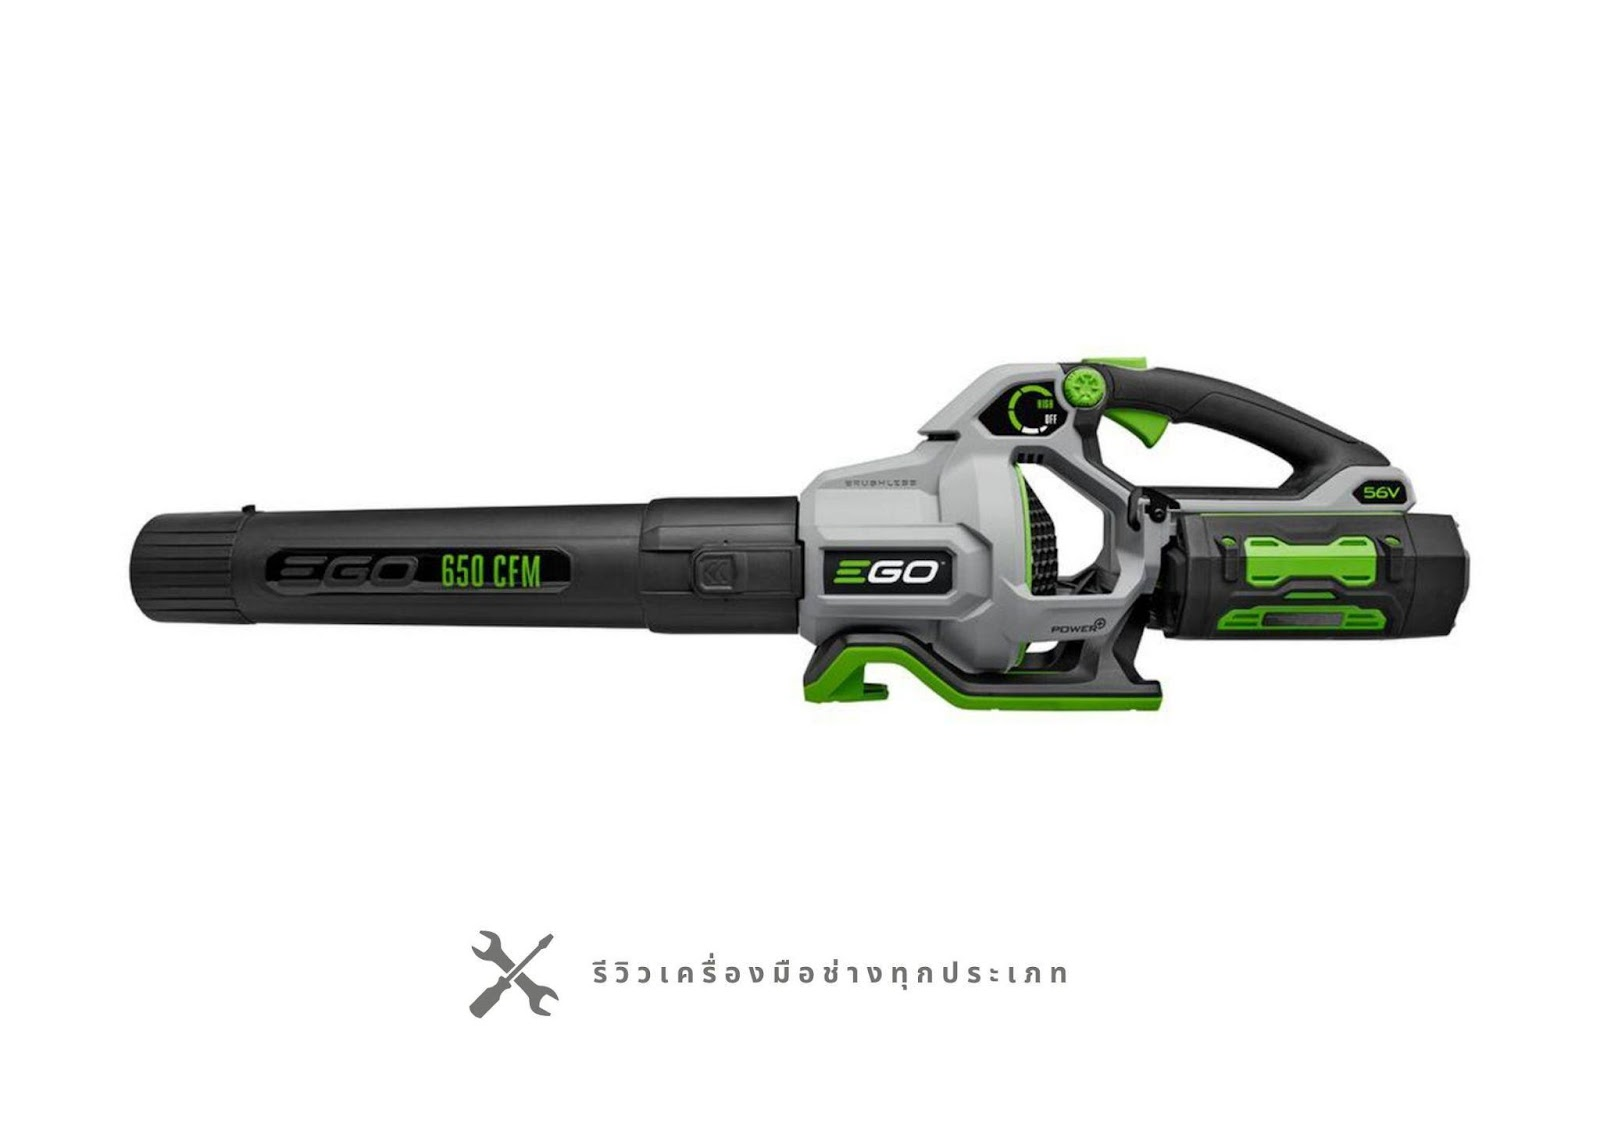 EGO 56V 650 CFM Blower